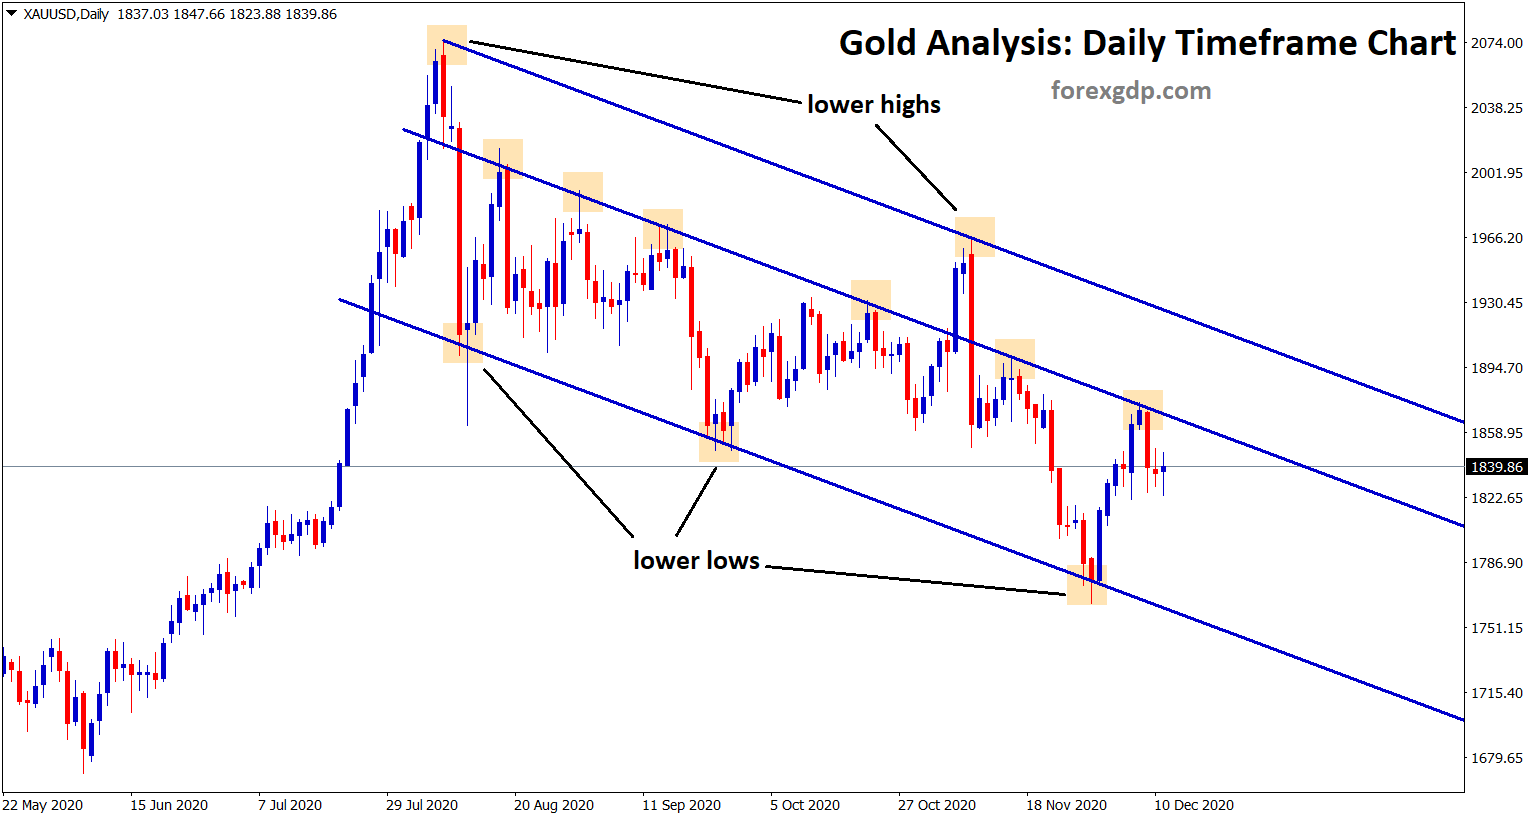 xauusd signal on gold down trend analysis